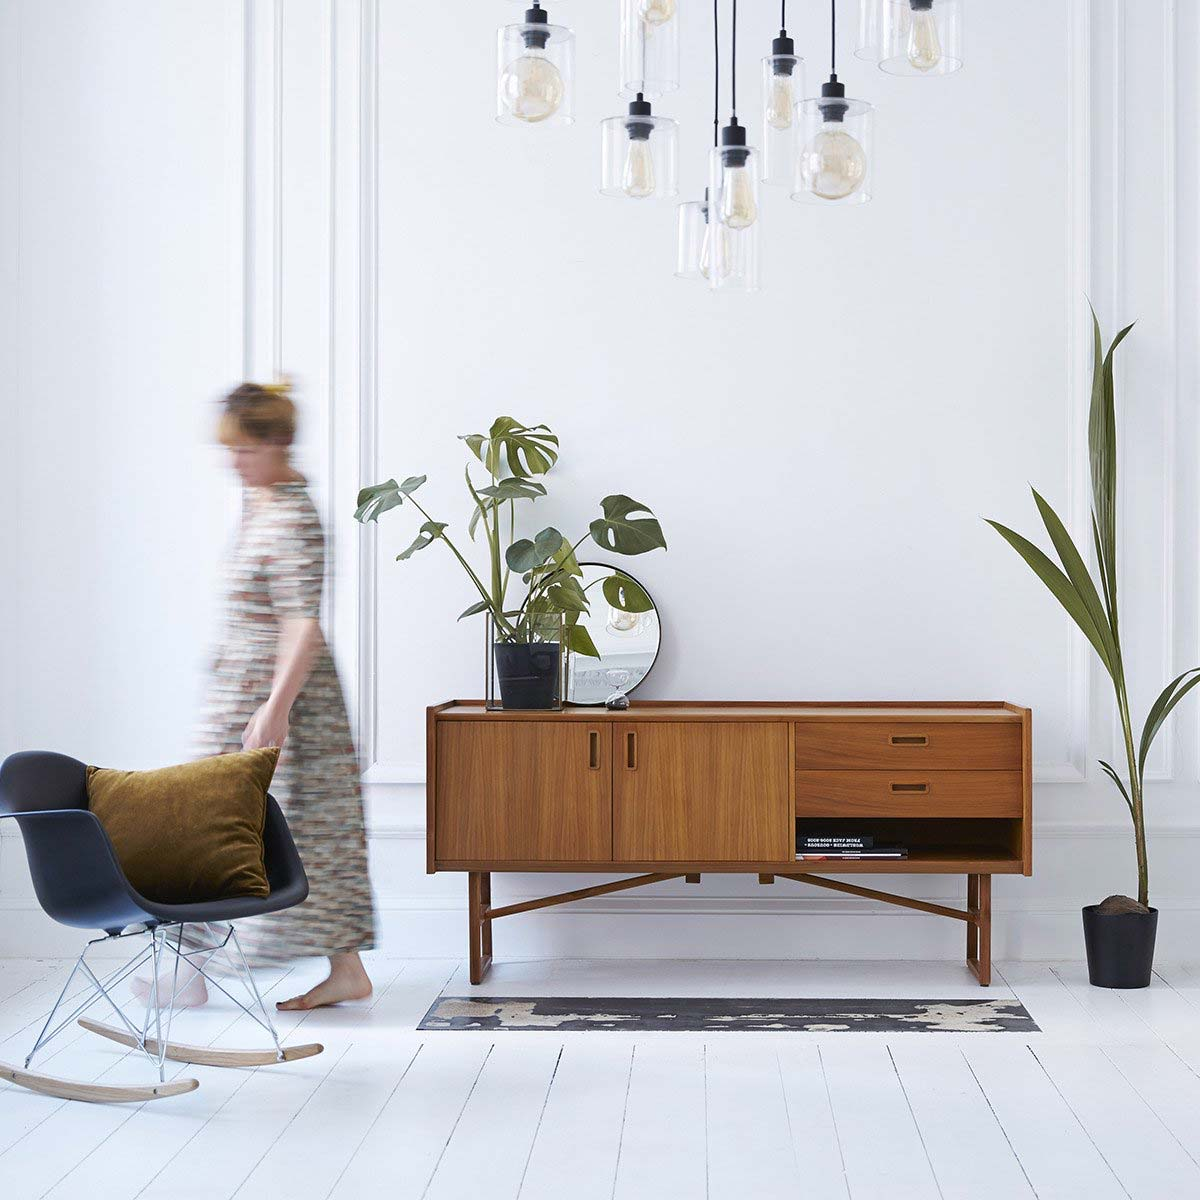 Decoration Interieur Appartement Vintage enfilade scandinave : 22 modèles du vintage au moderne